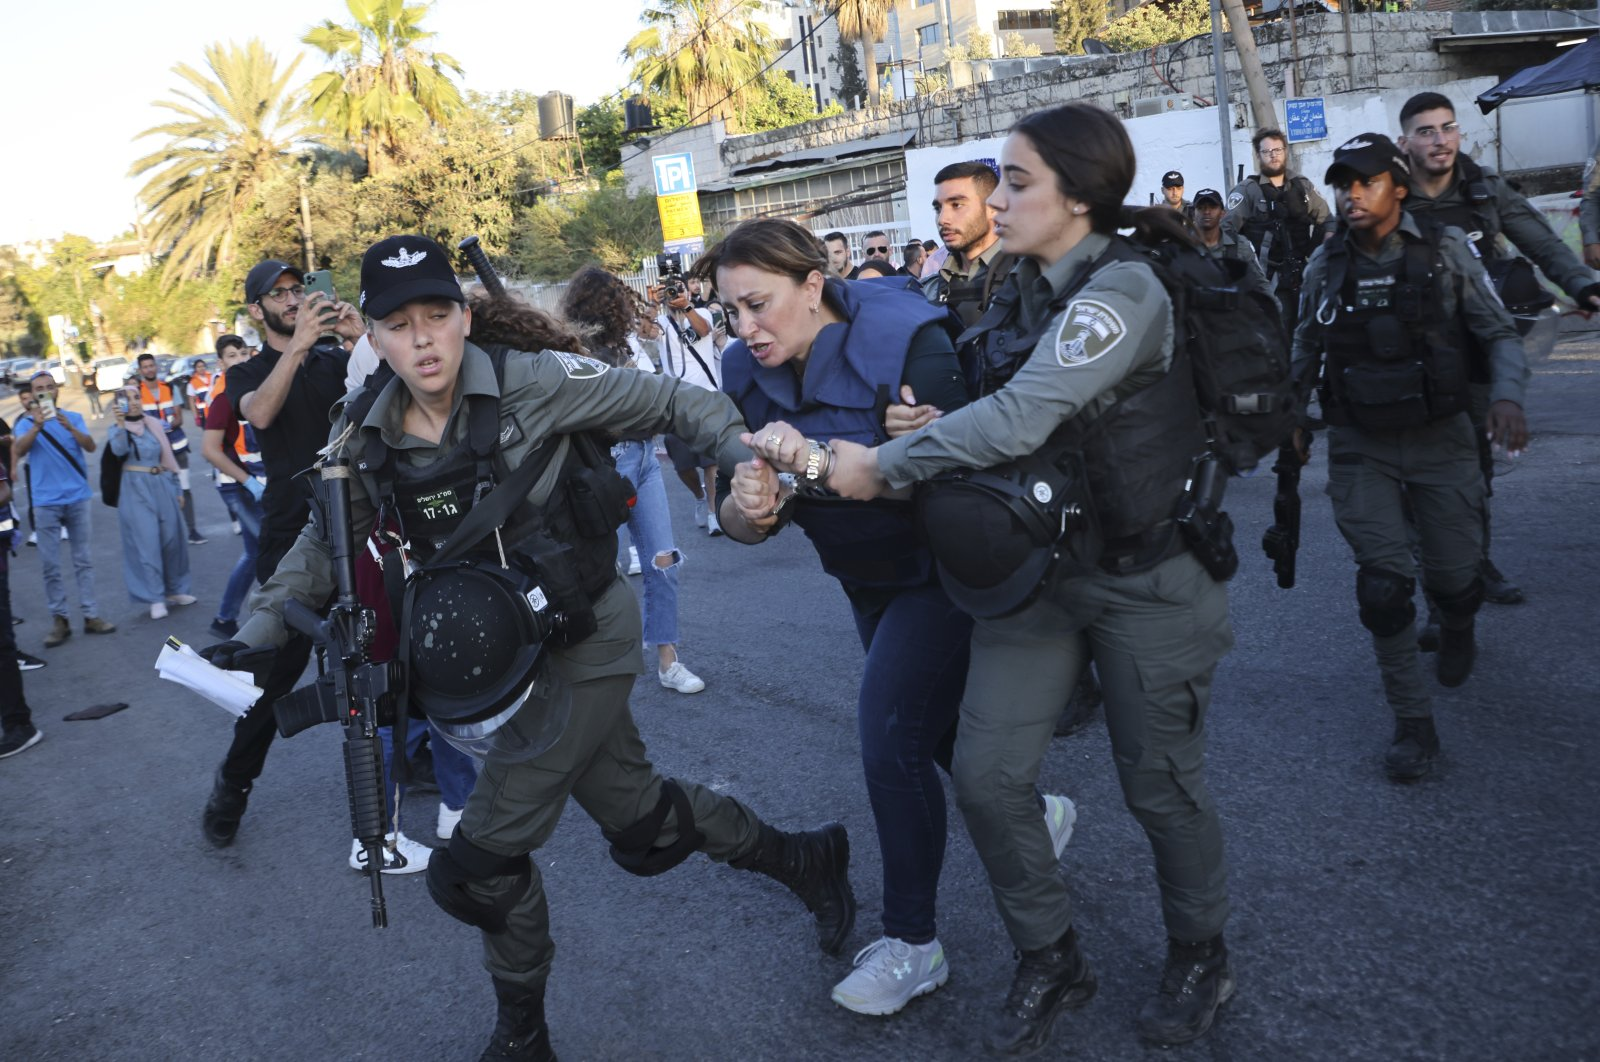 Israeli forces arrest Al Jazeera journalist Givara Budeiri during a protest in the Sheikh Jarrah neighborhood of East Jerusalem, occupied Palestine, Saturday, June 5, 2021. (AP Photo)